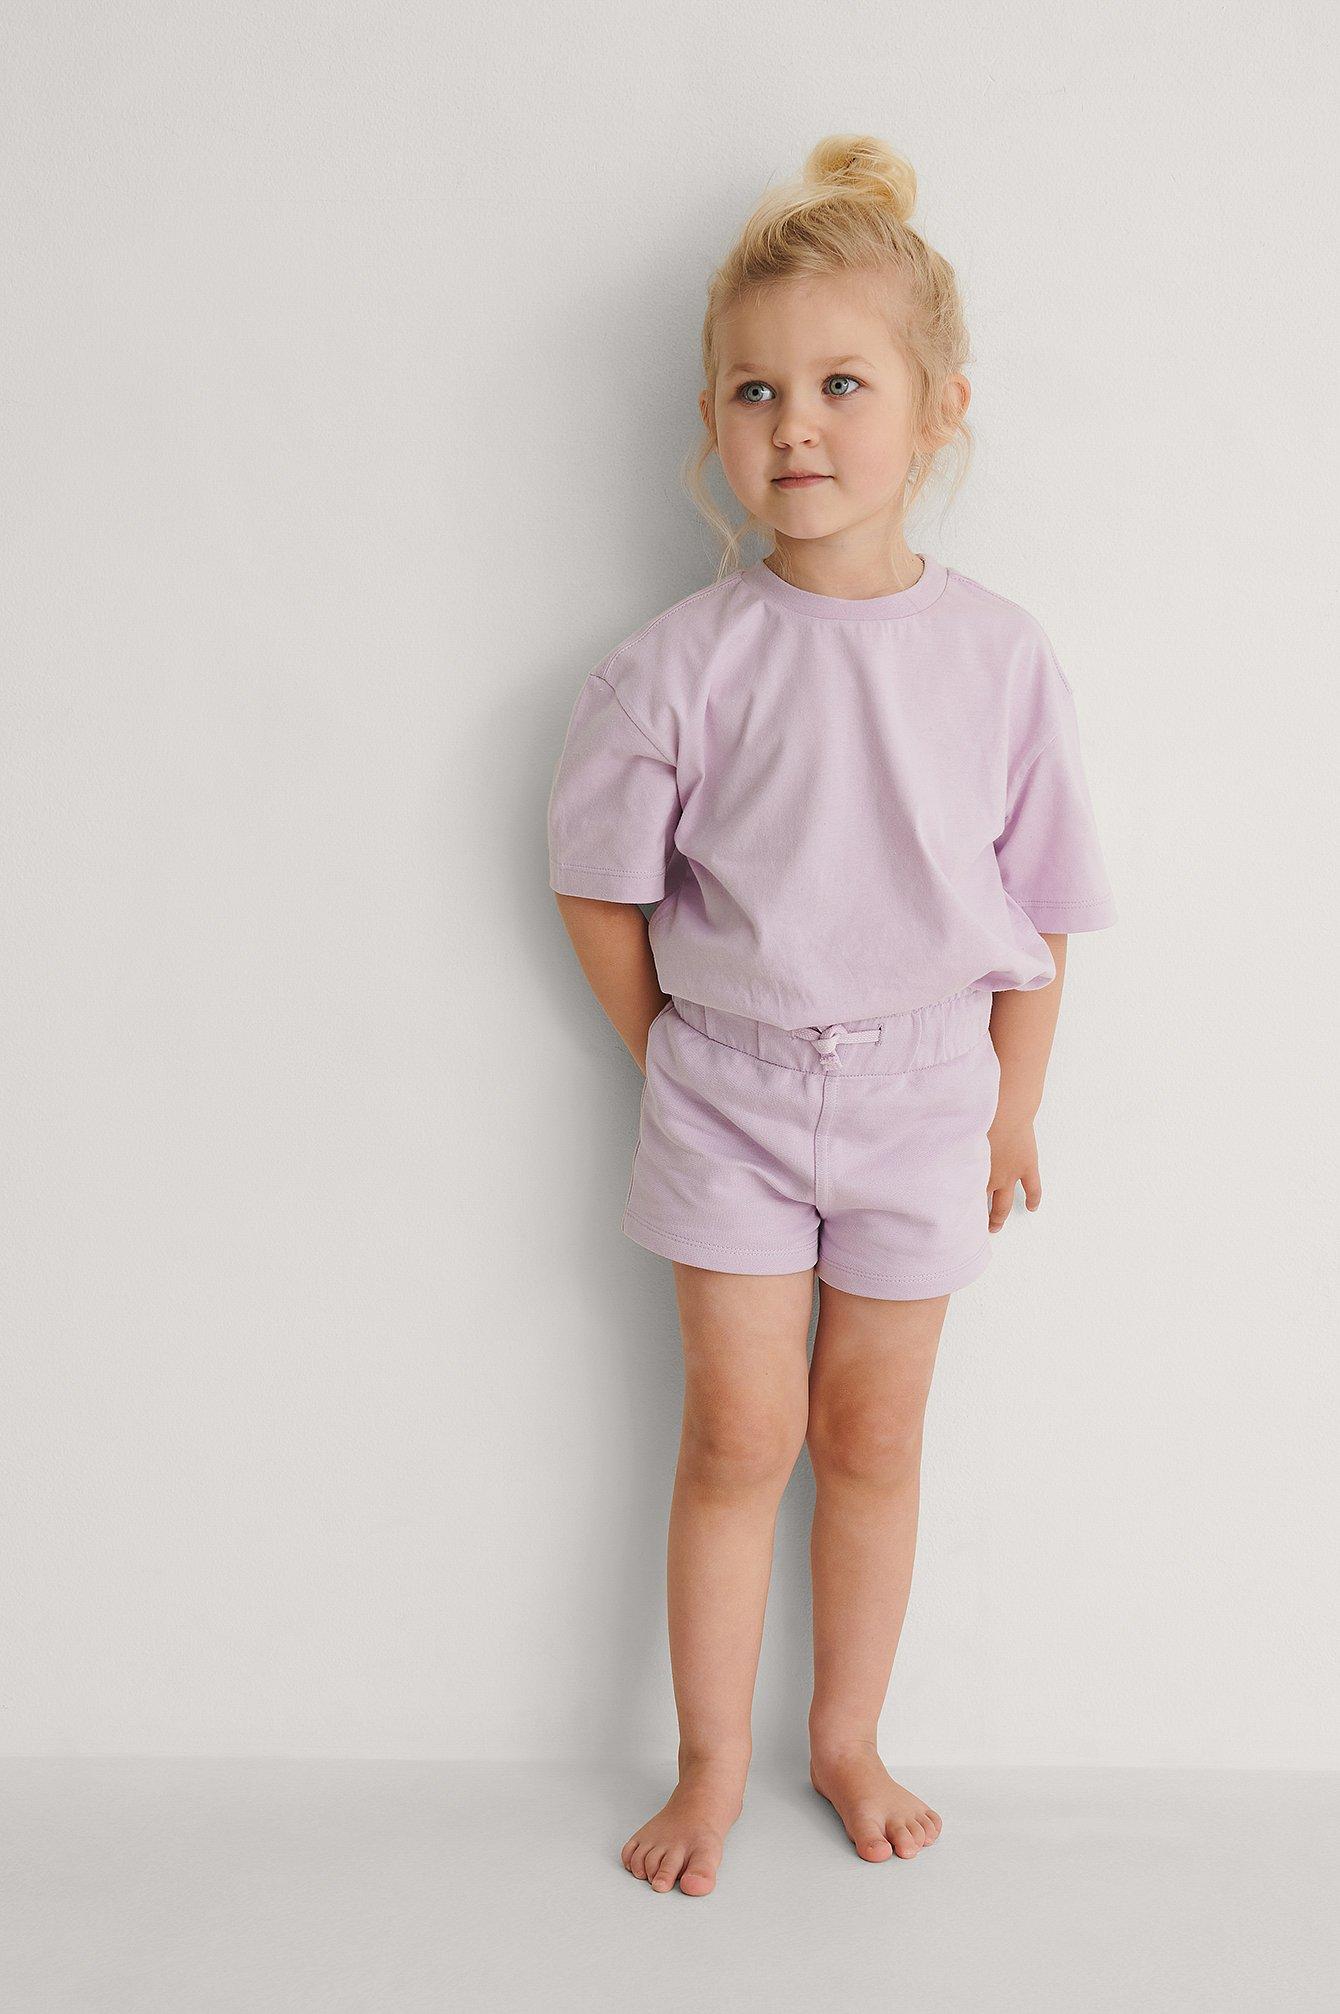 KIDS by NA-KD Orgaaniset Lyhyet Basic-Jerseyshortsit - Purple